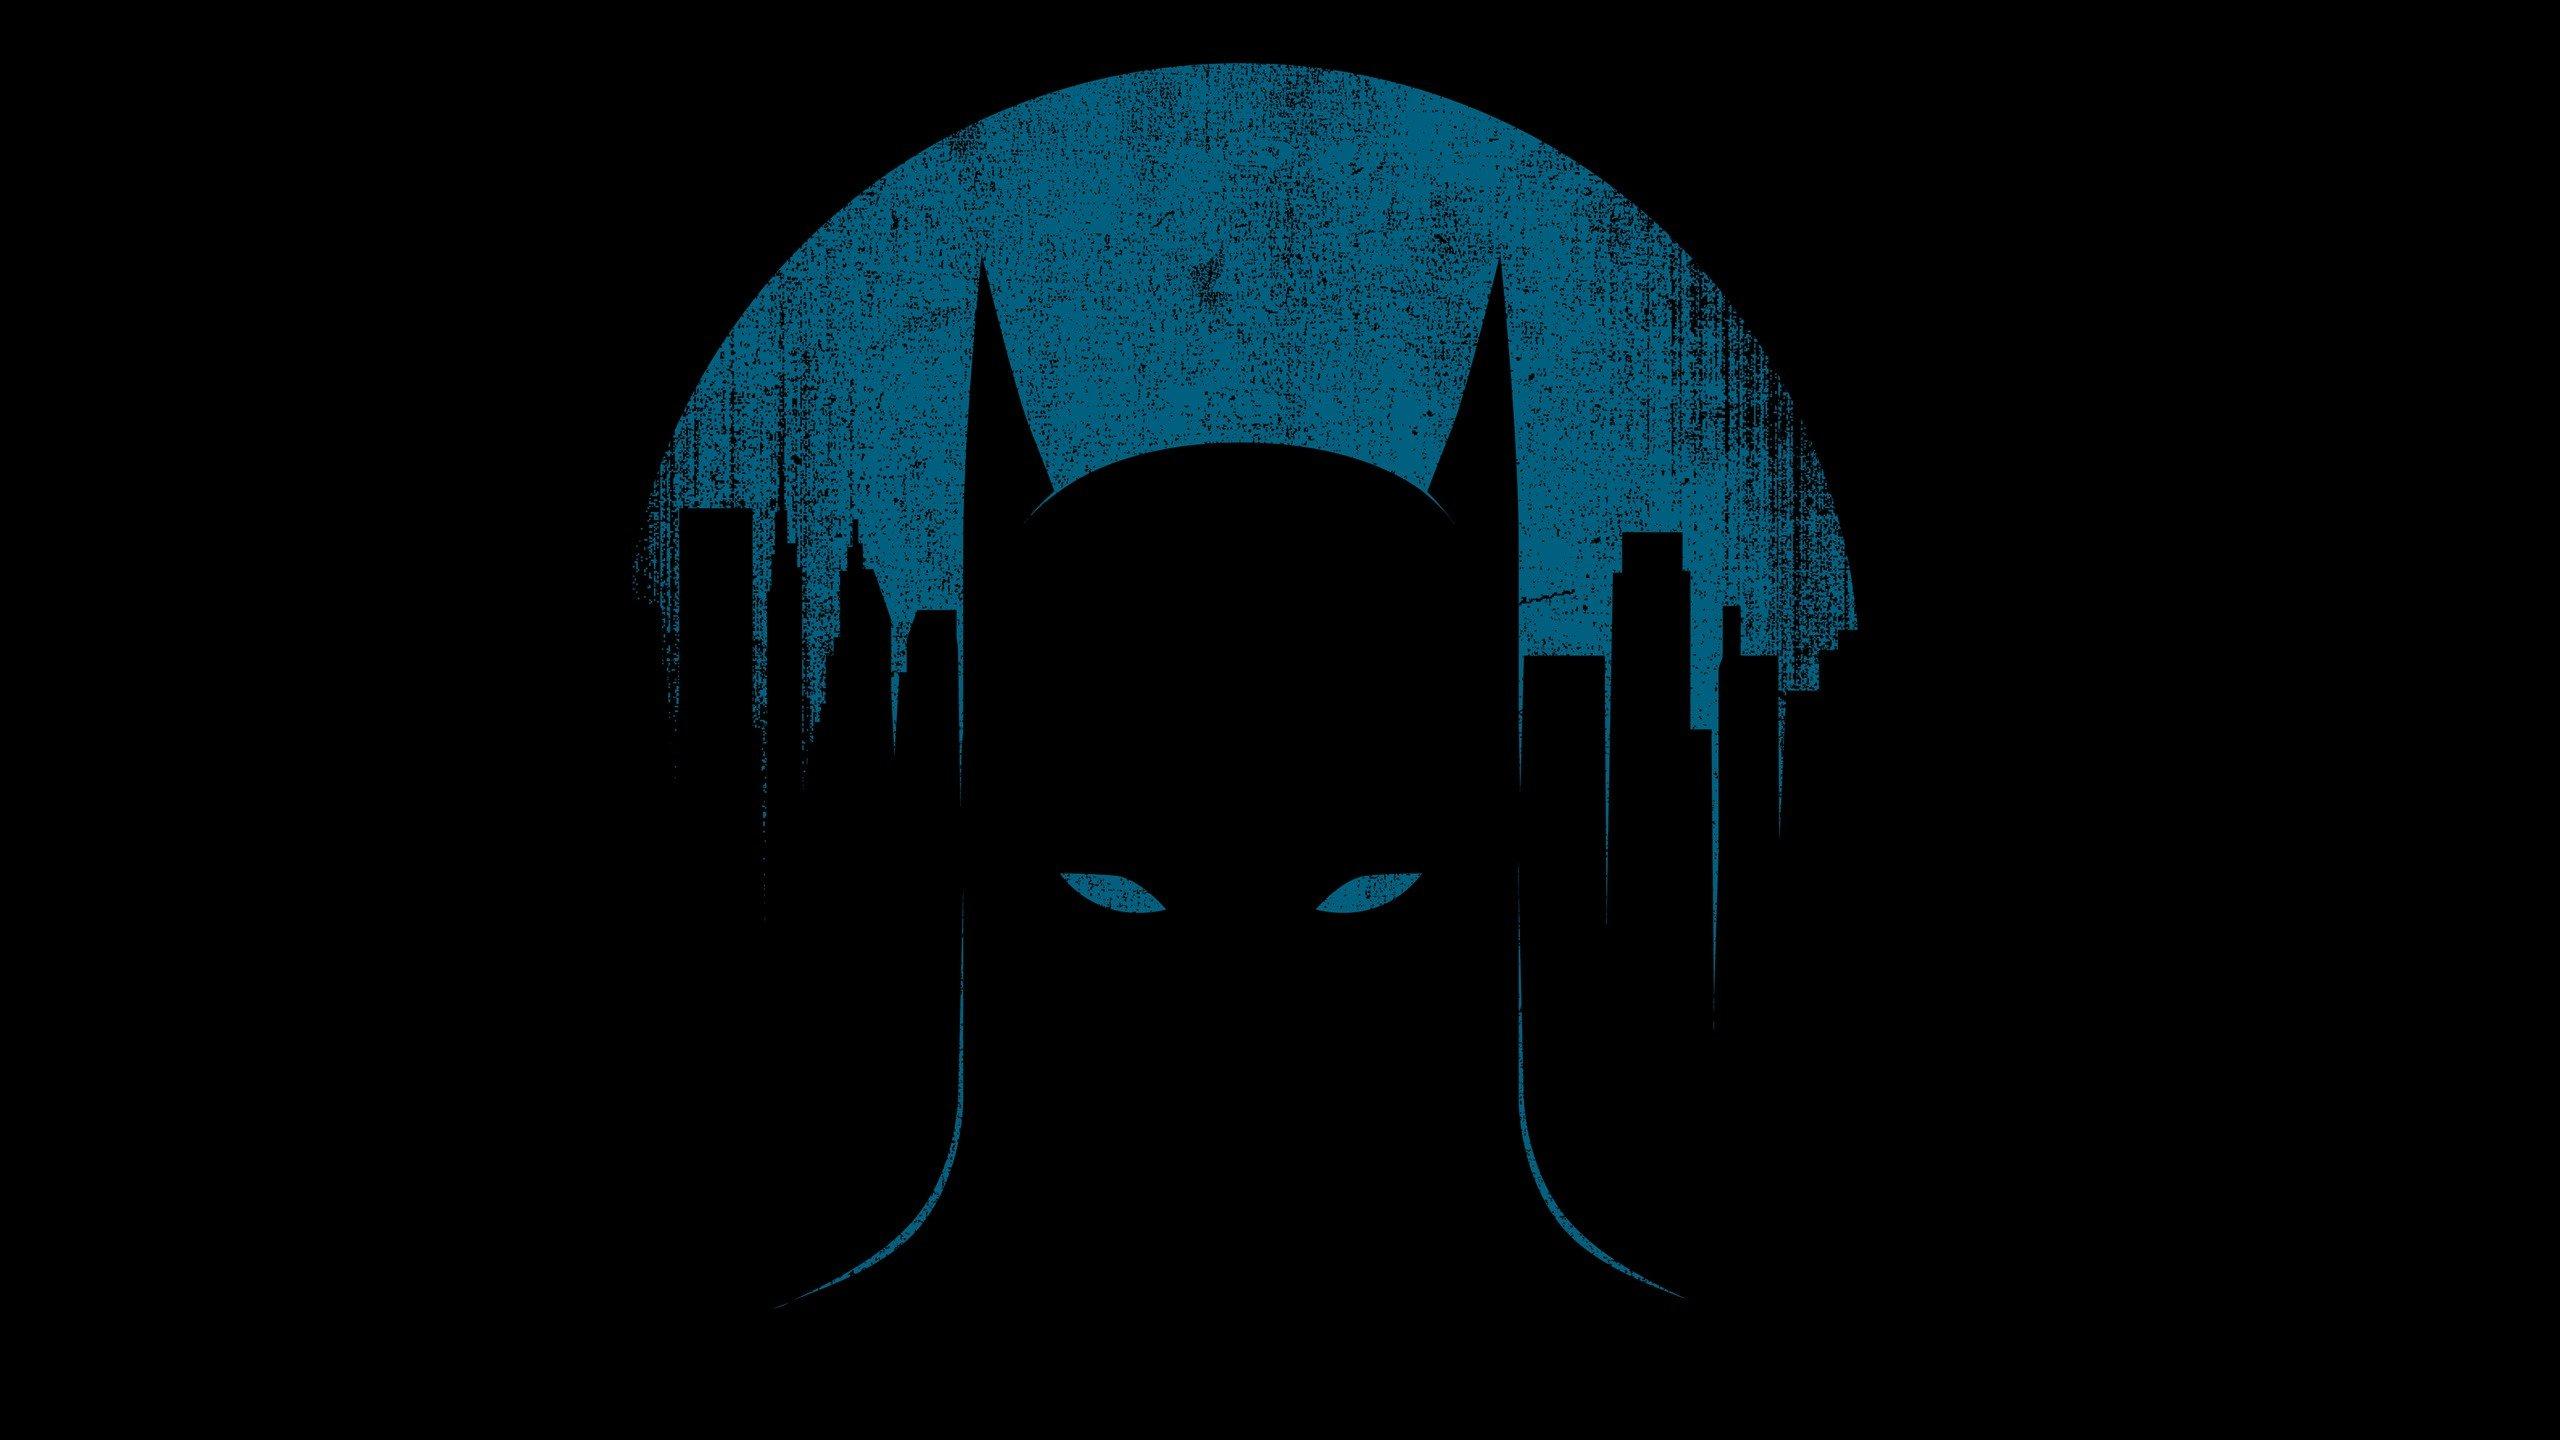 Download 77+ Wallpaper Black Batman Gratis